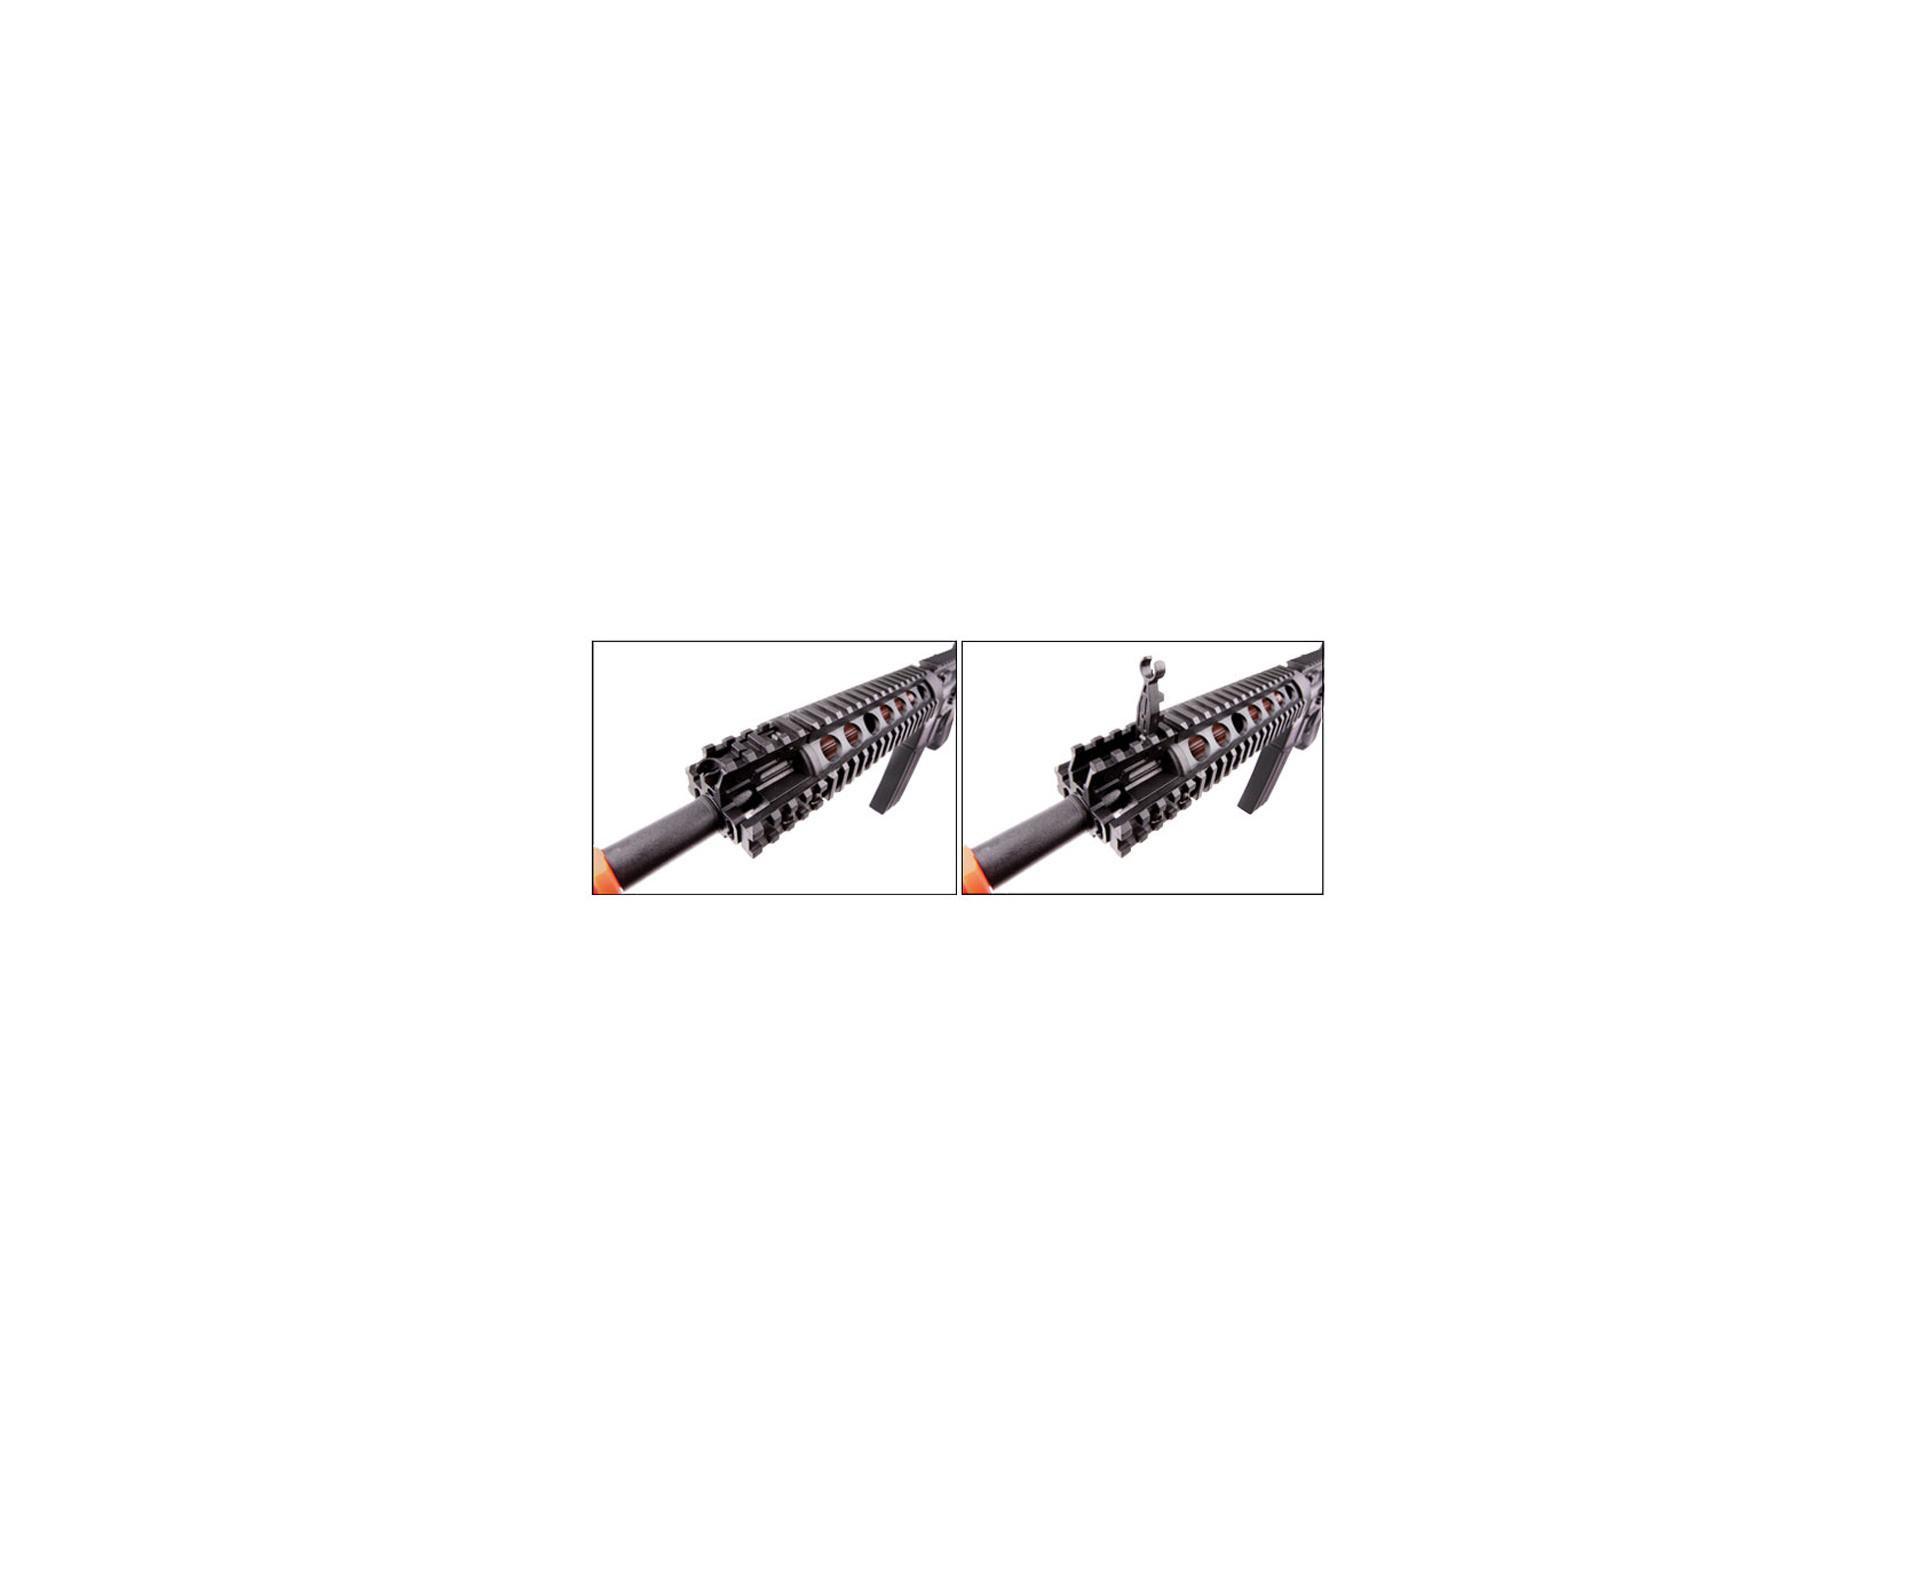 Rifle De Airsoft M4 Cqb - Semi/metal - Calibre 6 Mm Bbs - Crosman (game Face)